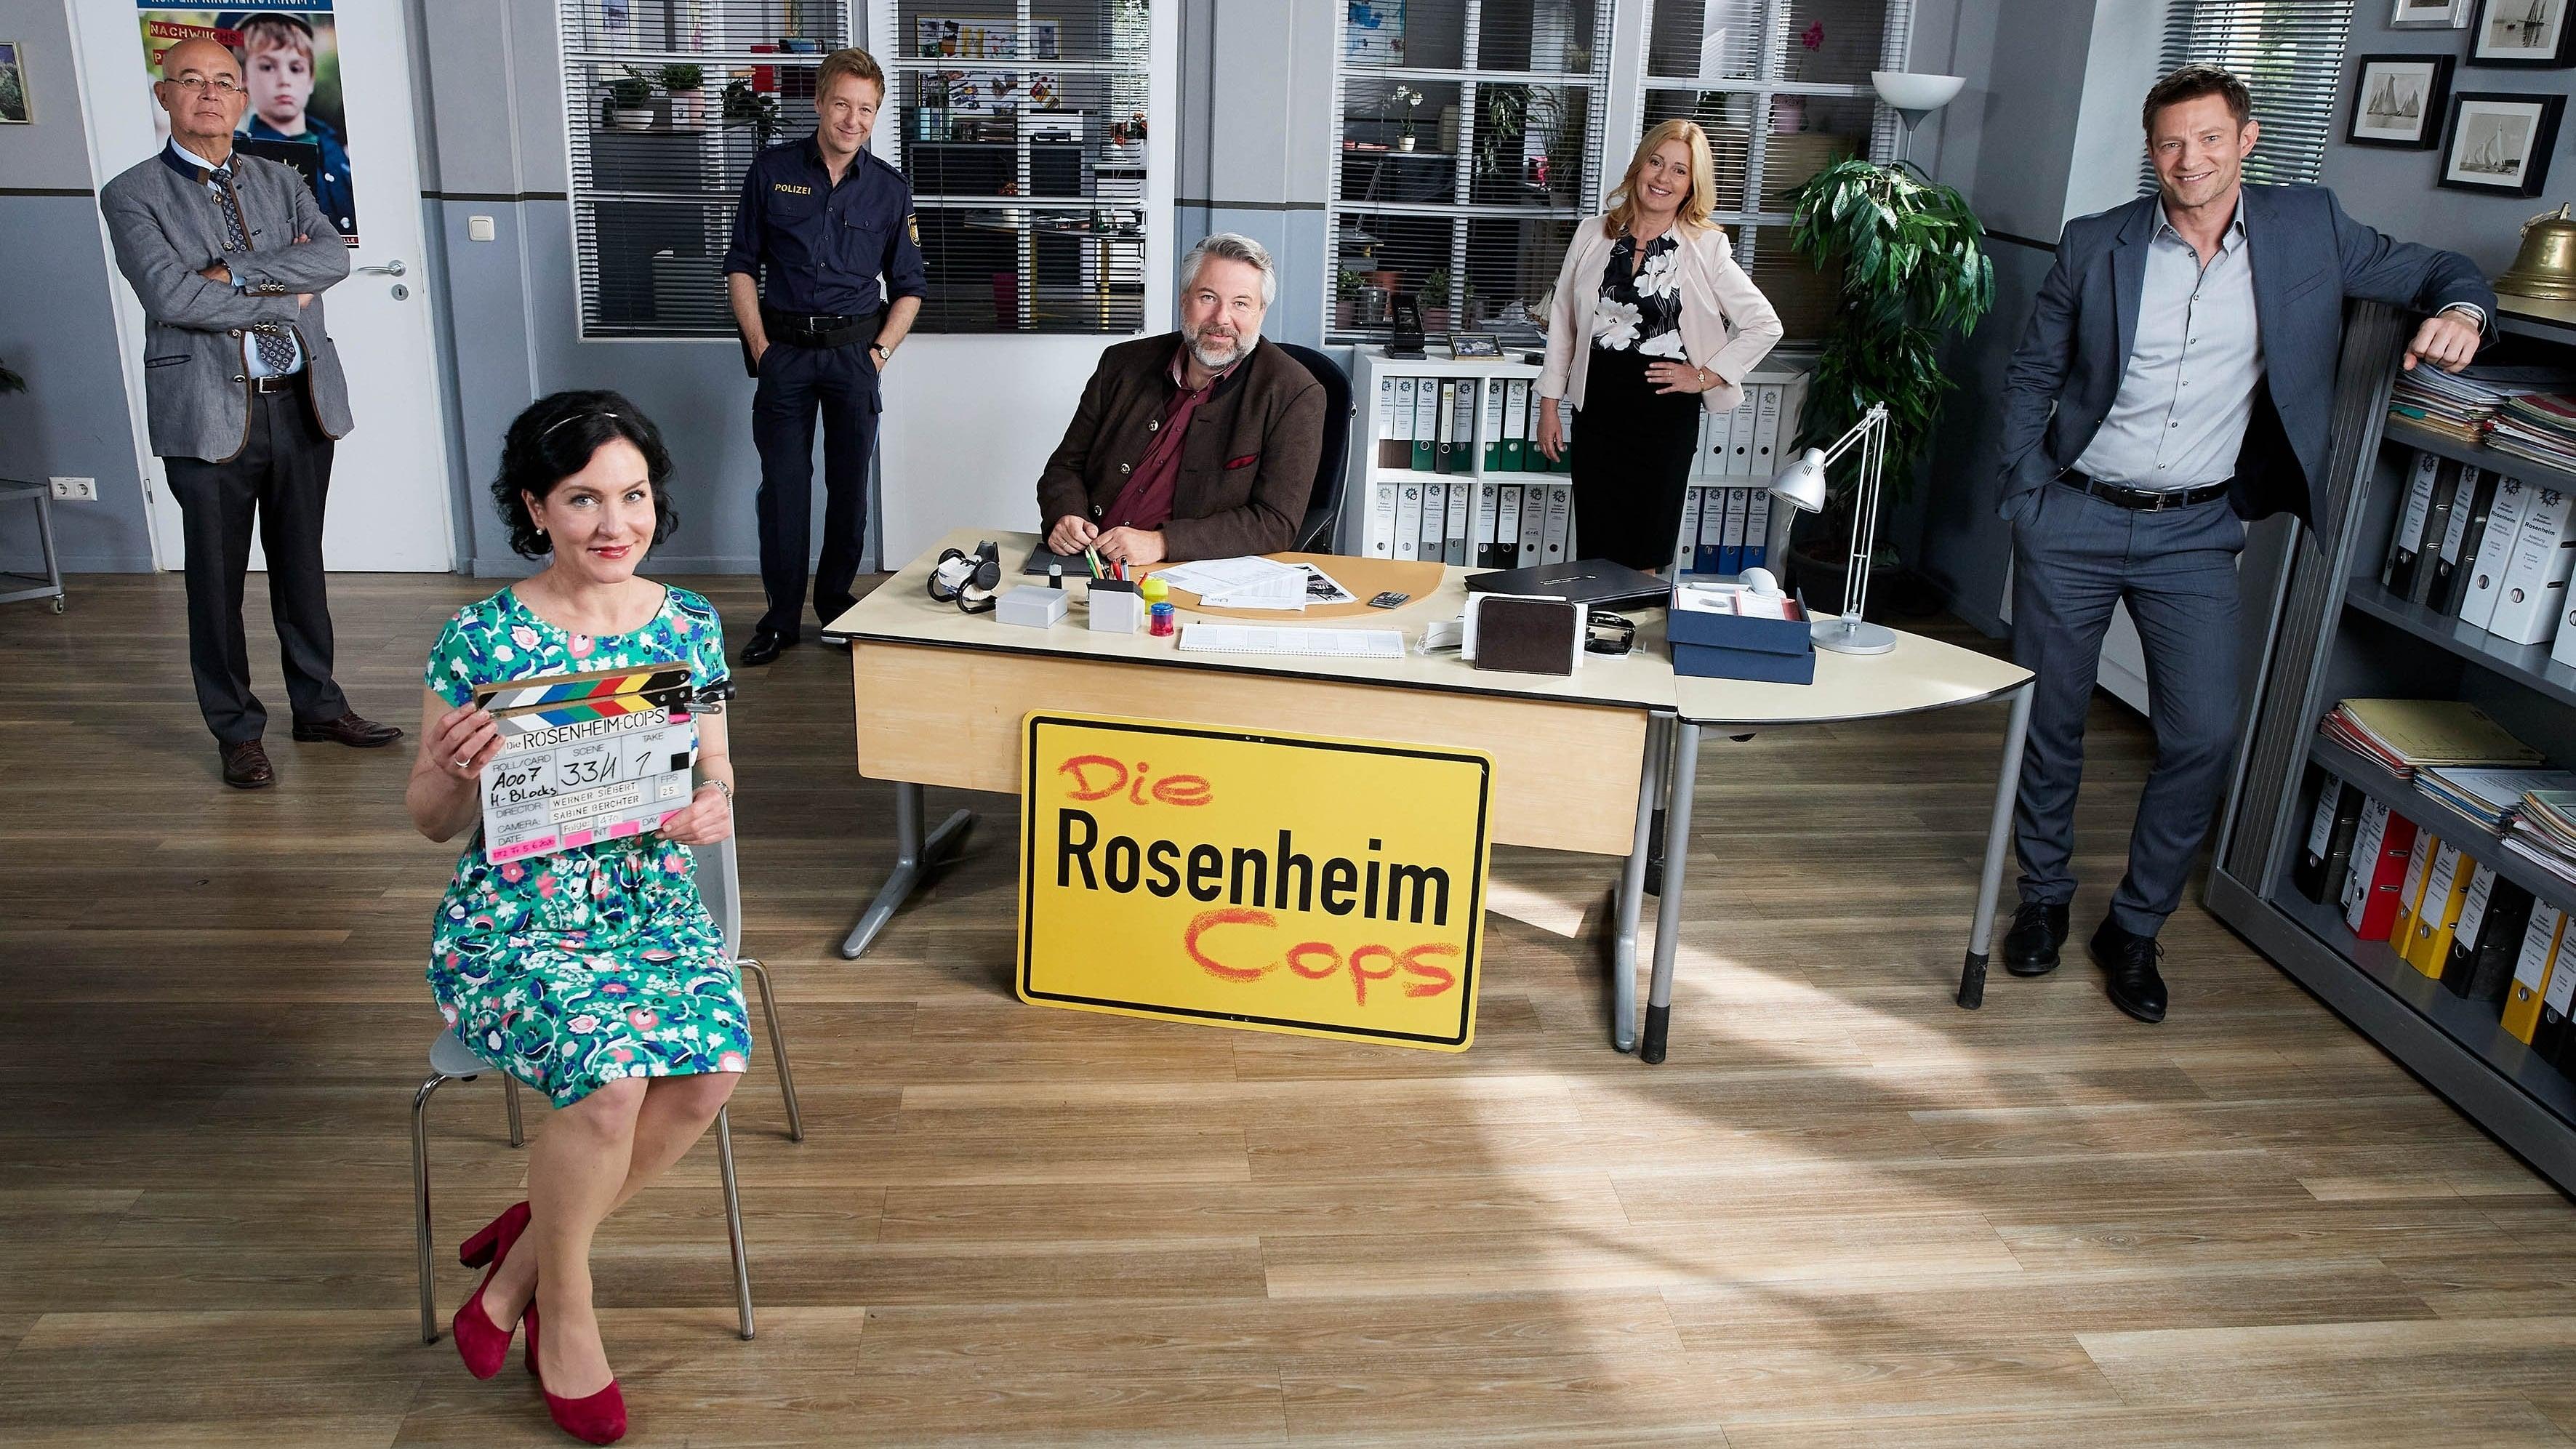 Die Rosenheim-Cops - Specials